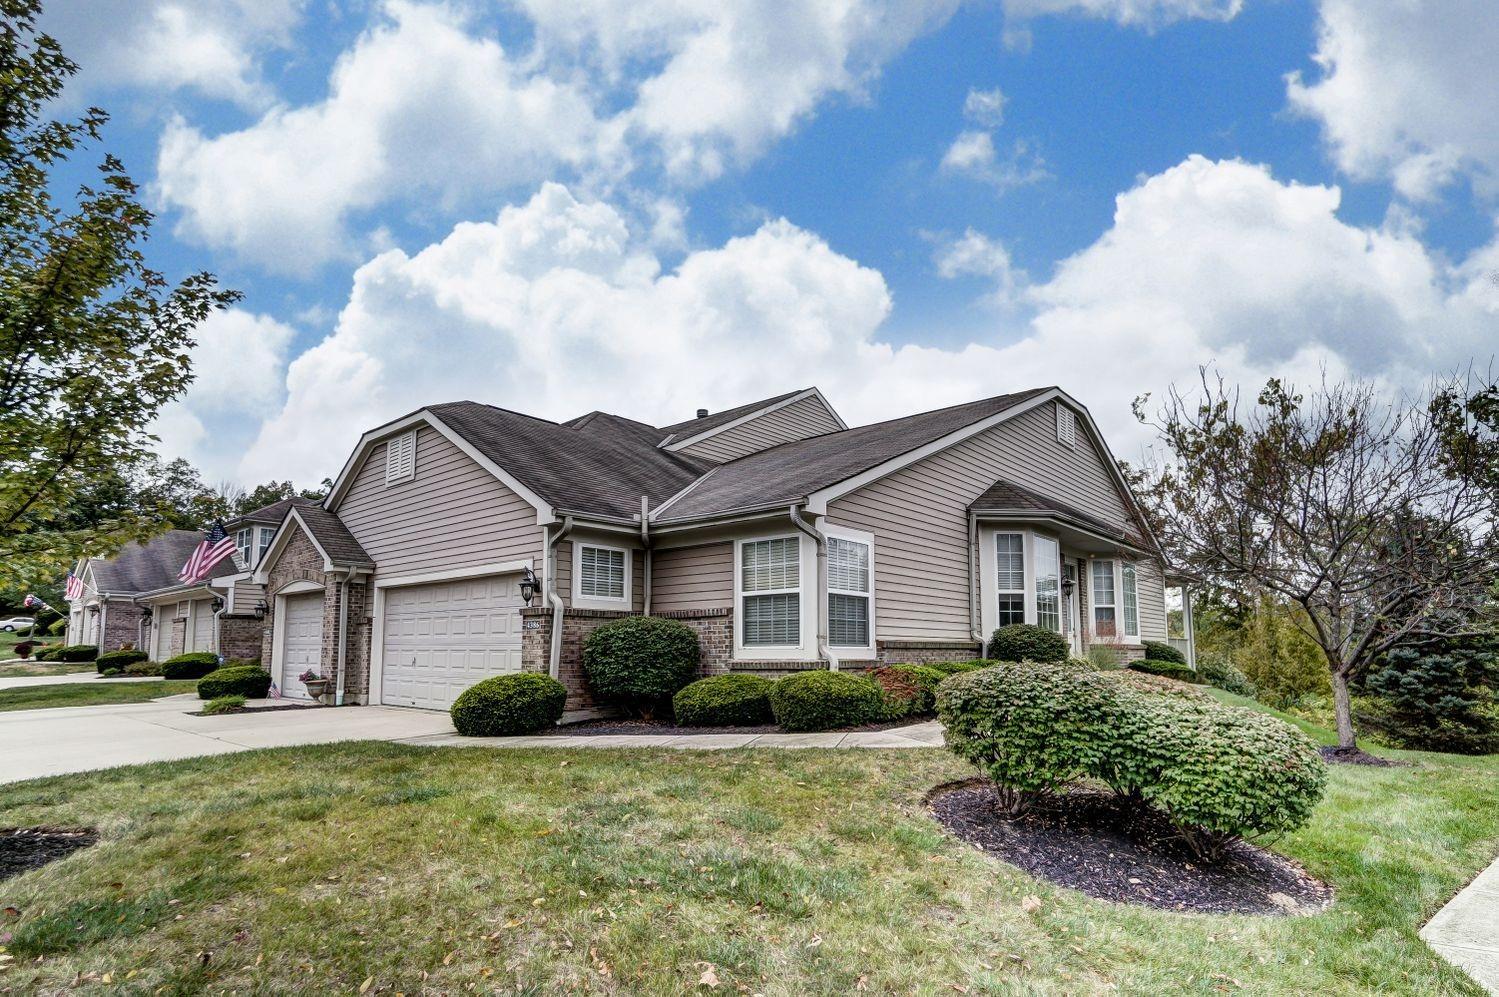 Property for sale at 4386 Marival Way, Mason,  OH 45040